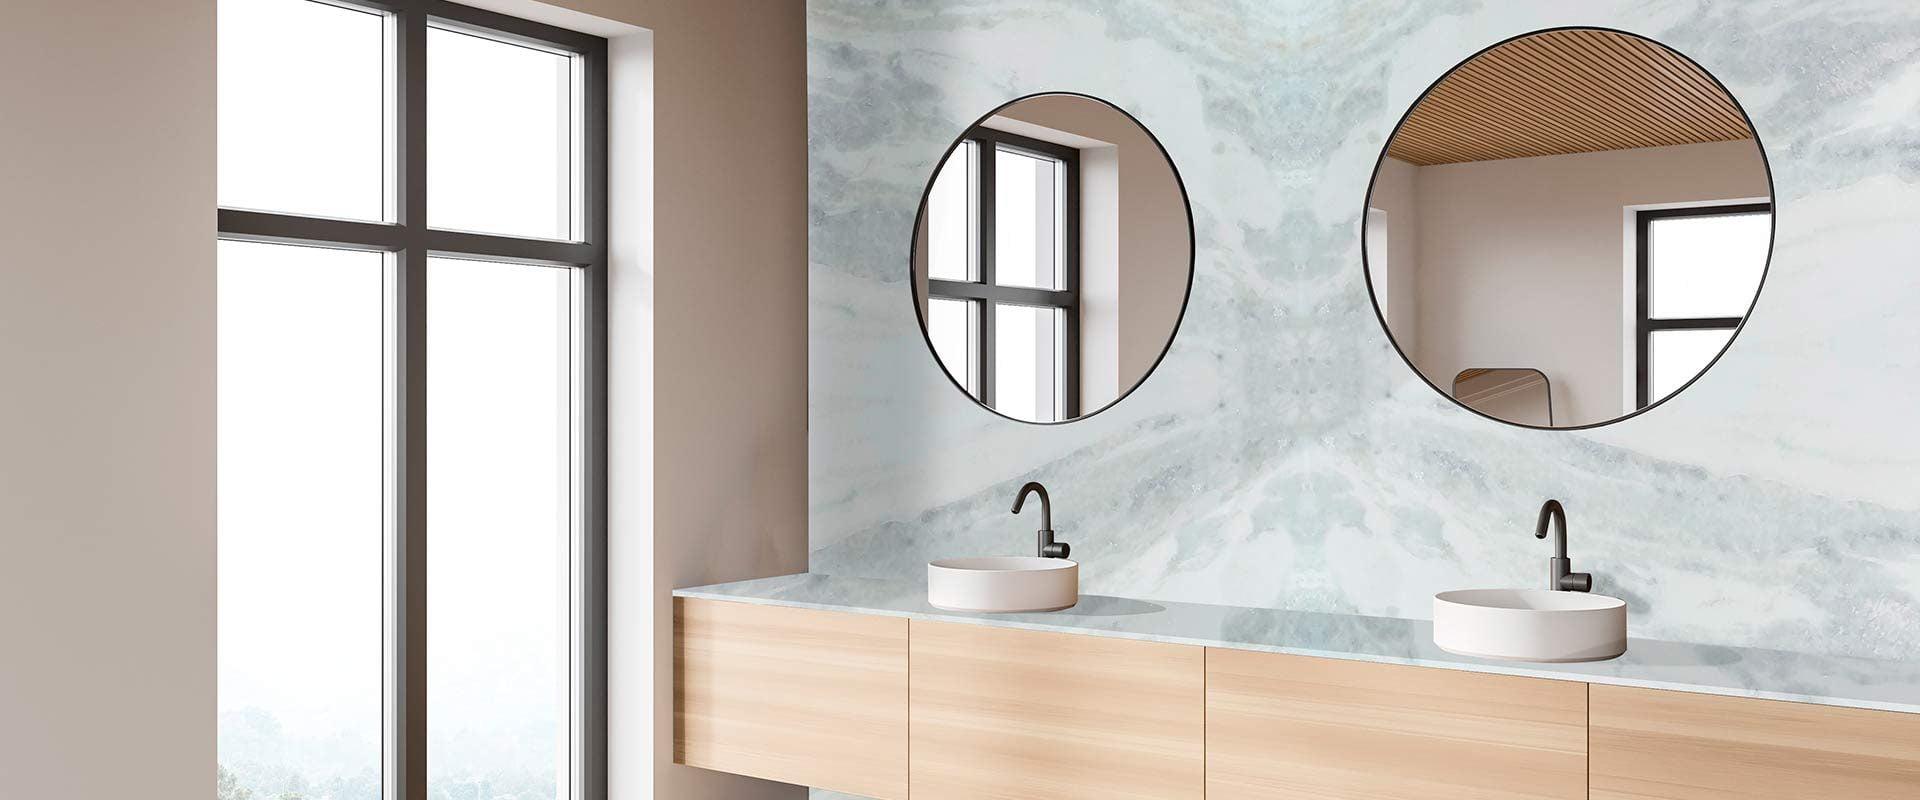 banheiro-bianco-impala-1